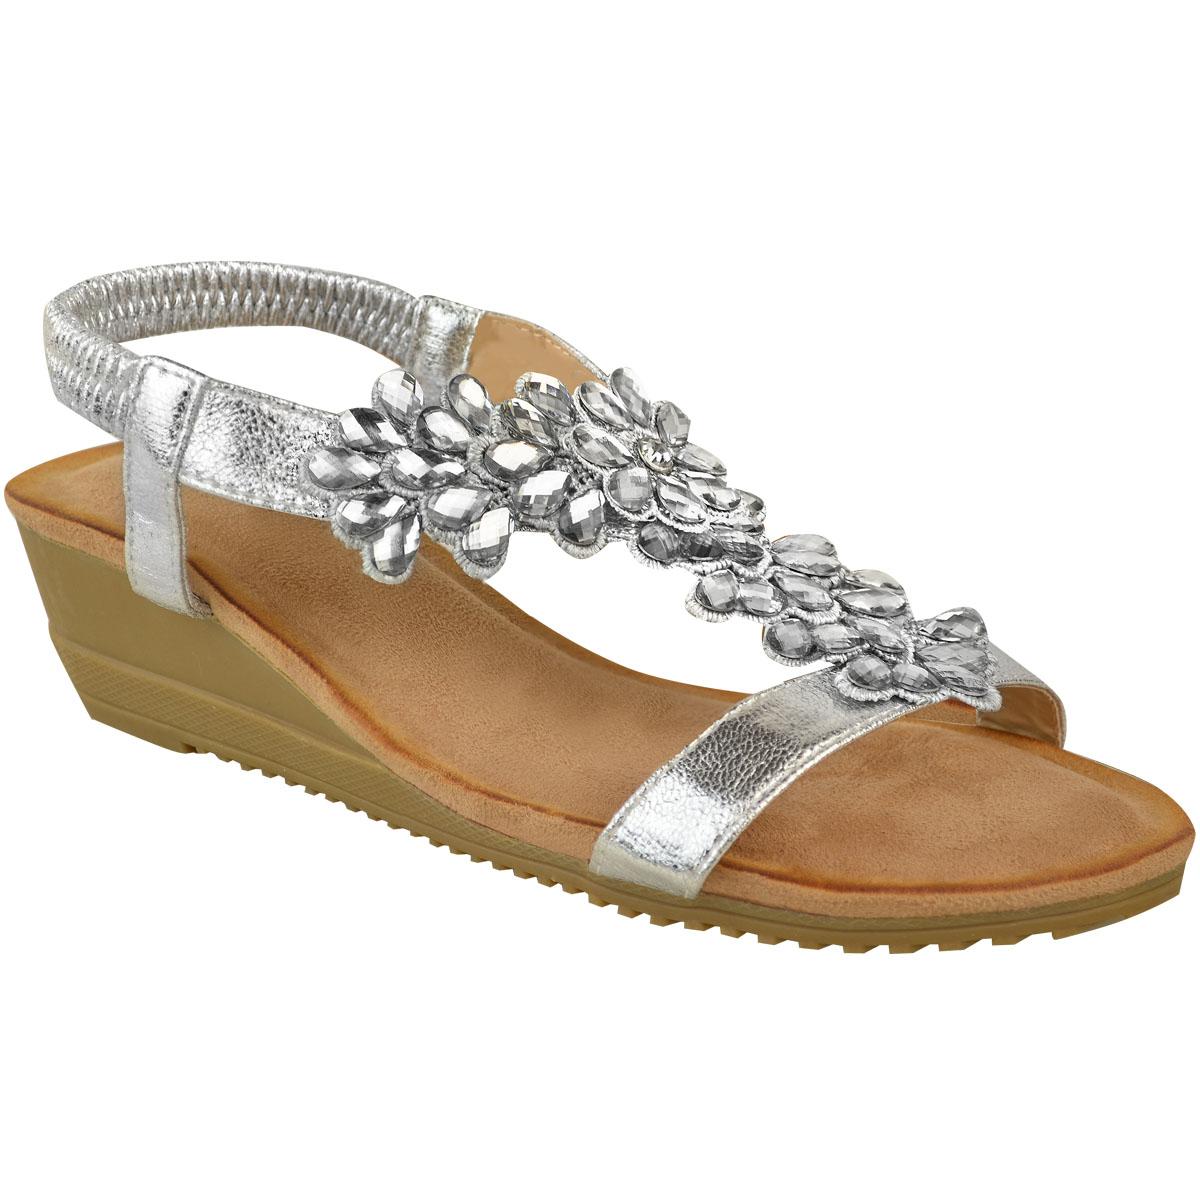 Mujer-Damas-Tacon-Bajo-Cuna-Zapatos-Sandalias-Diamante-Fiesta-Boda-Talla-Stretch